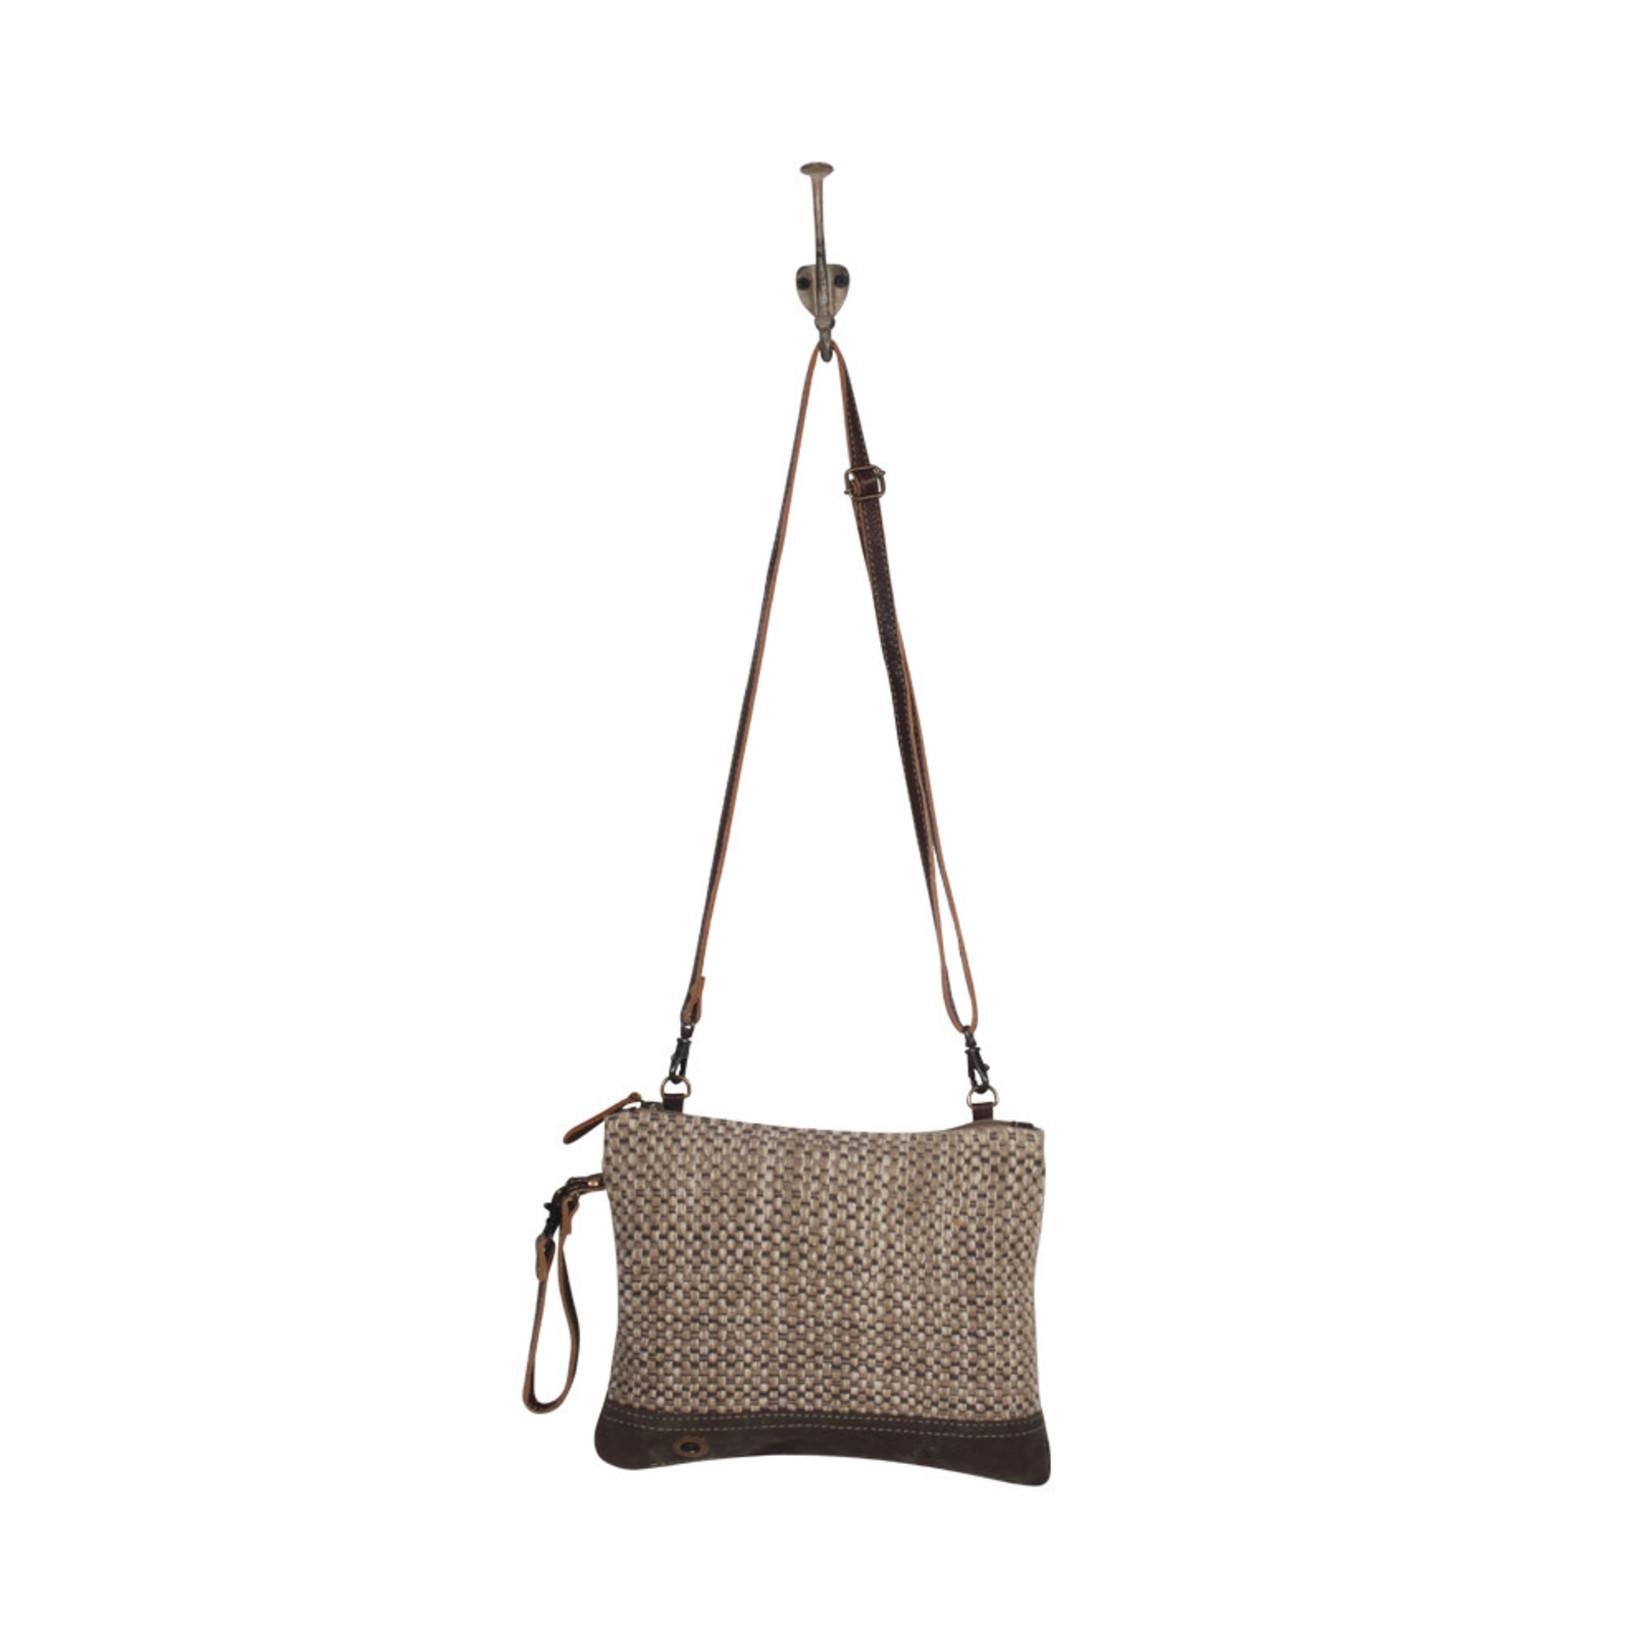 Myra Bags S-2079 Liliput Small & Crossbody Bag